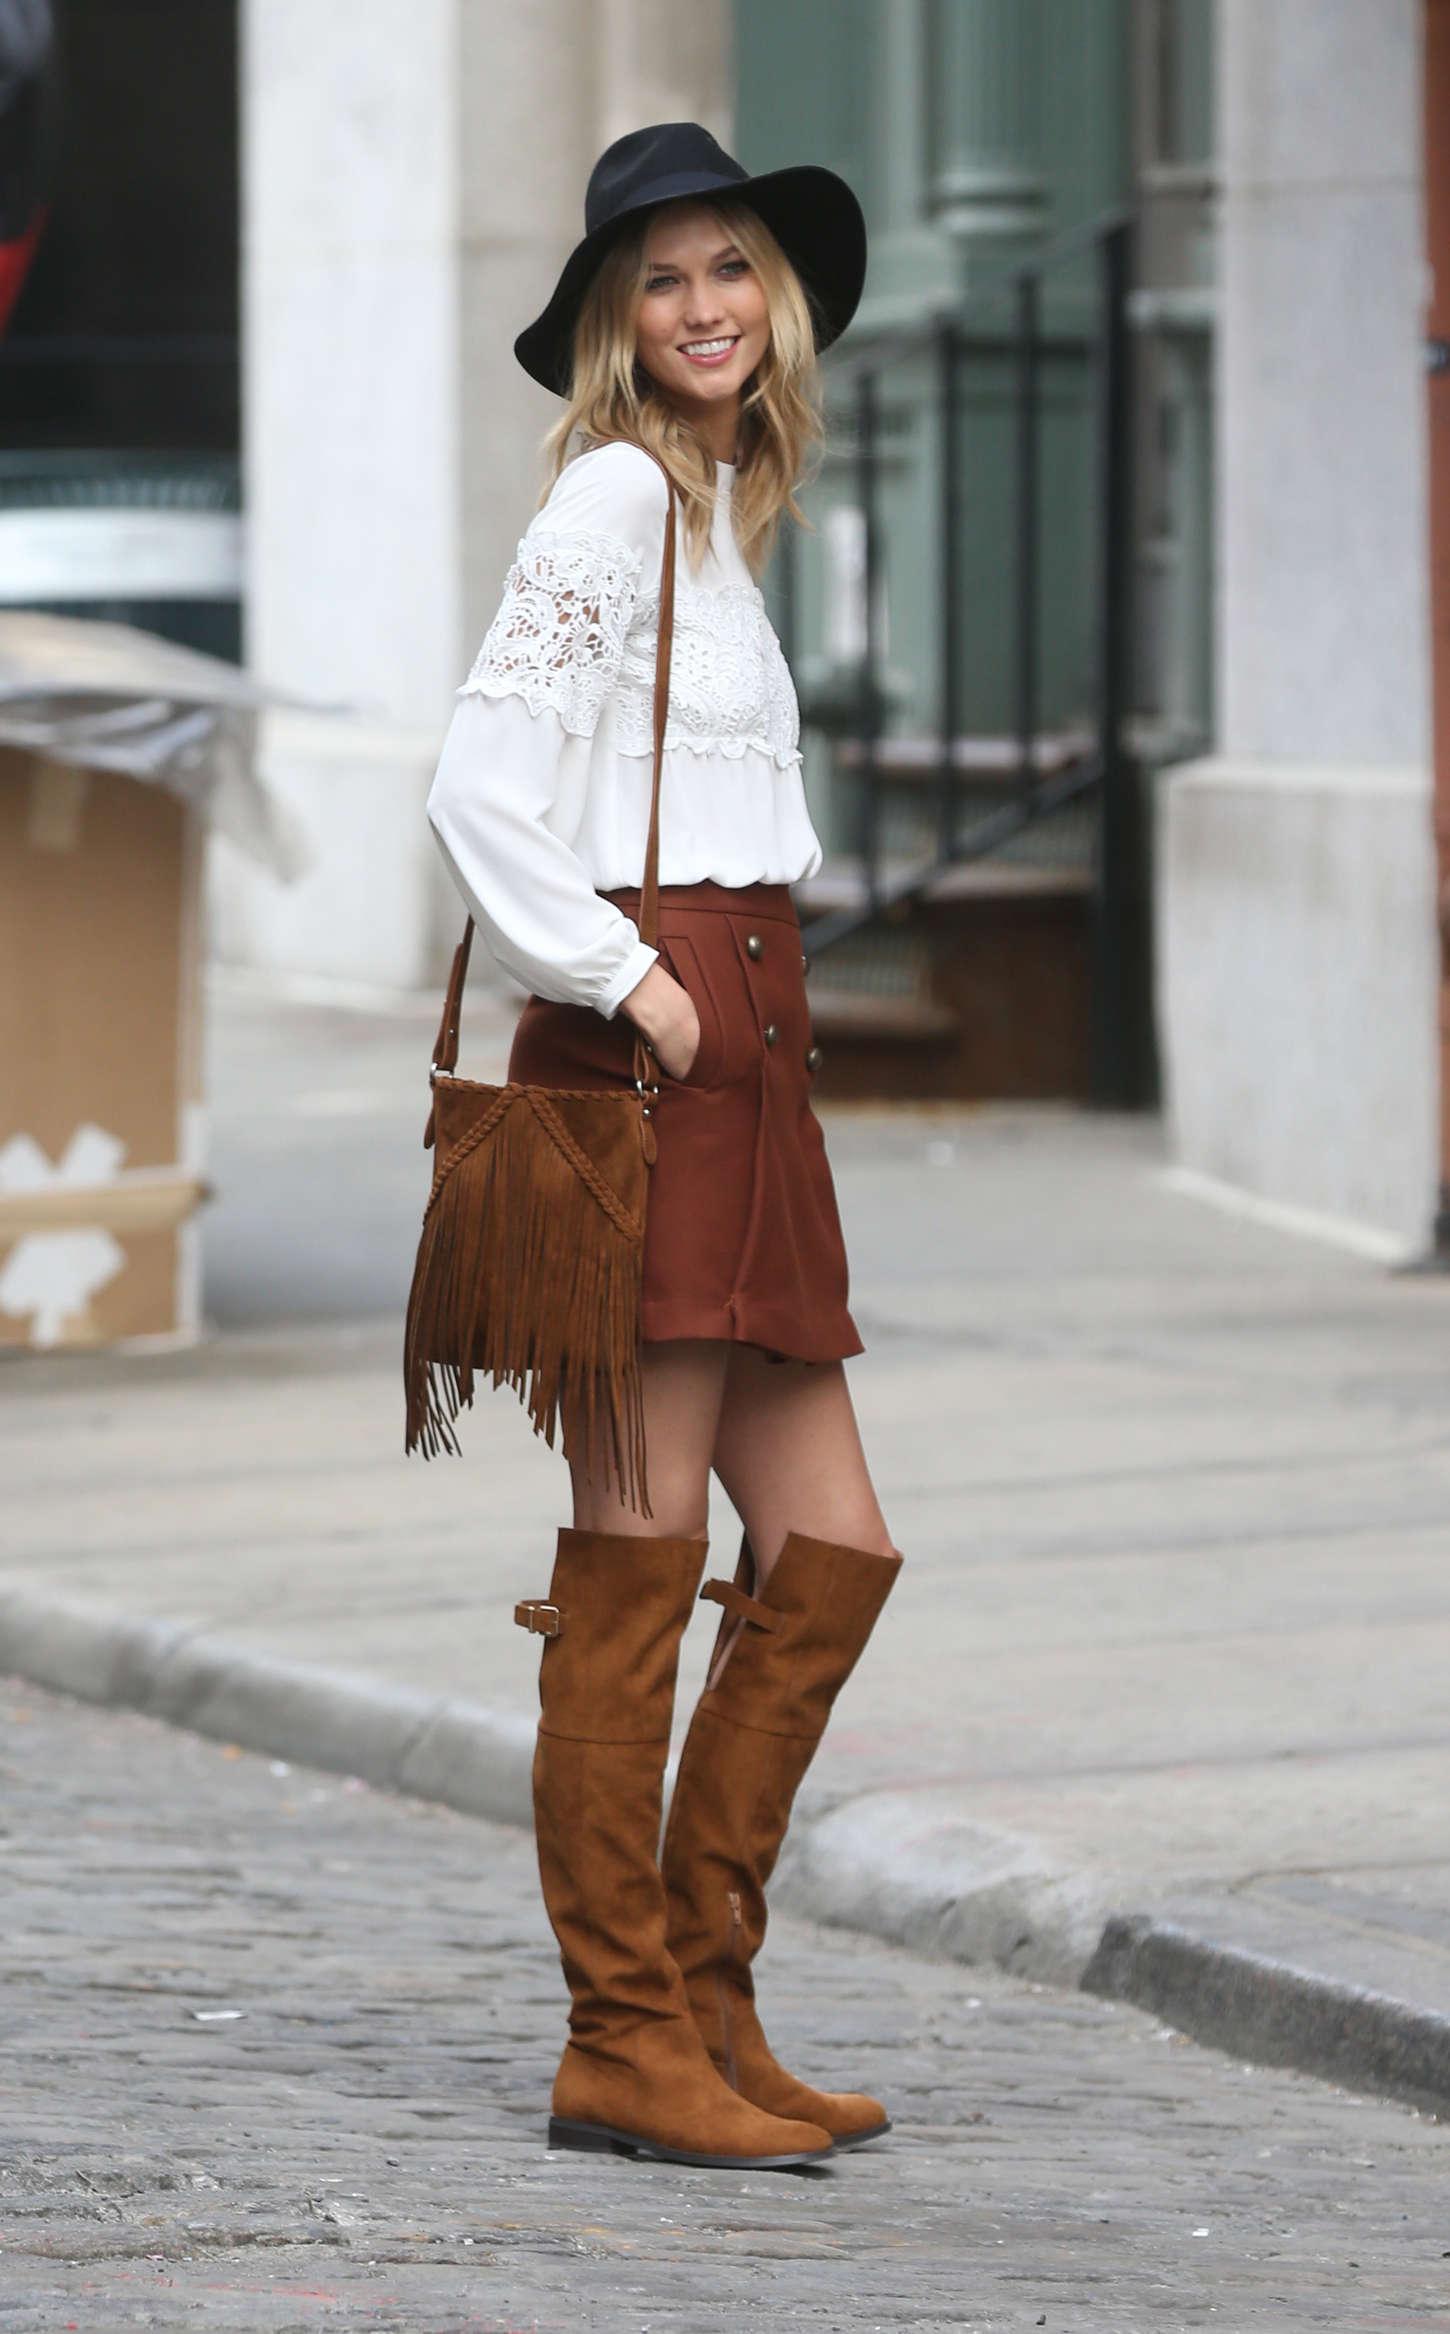 Karlie Kloss 2015 : Karlie Kloss: Photoshoot in NYC -49